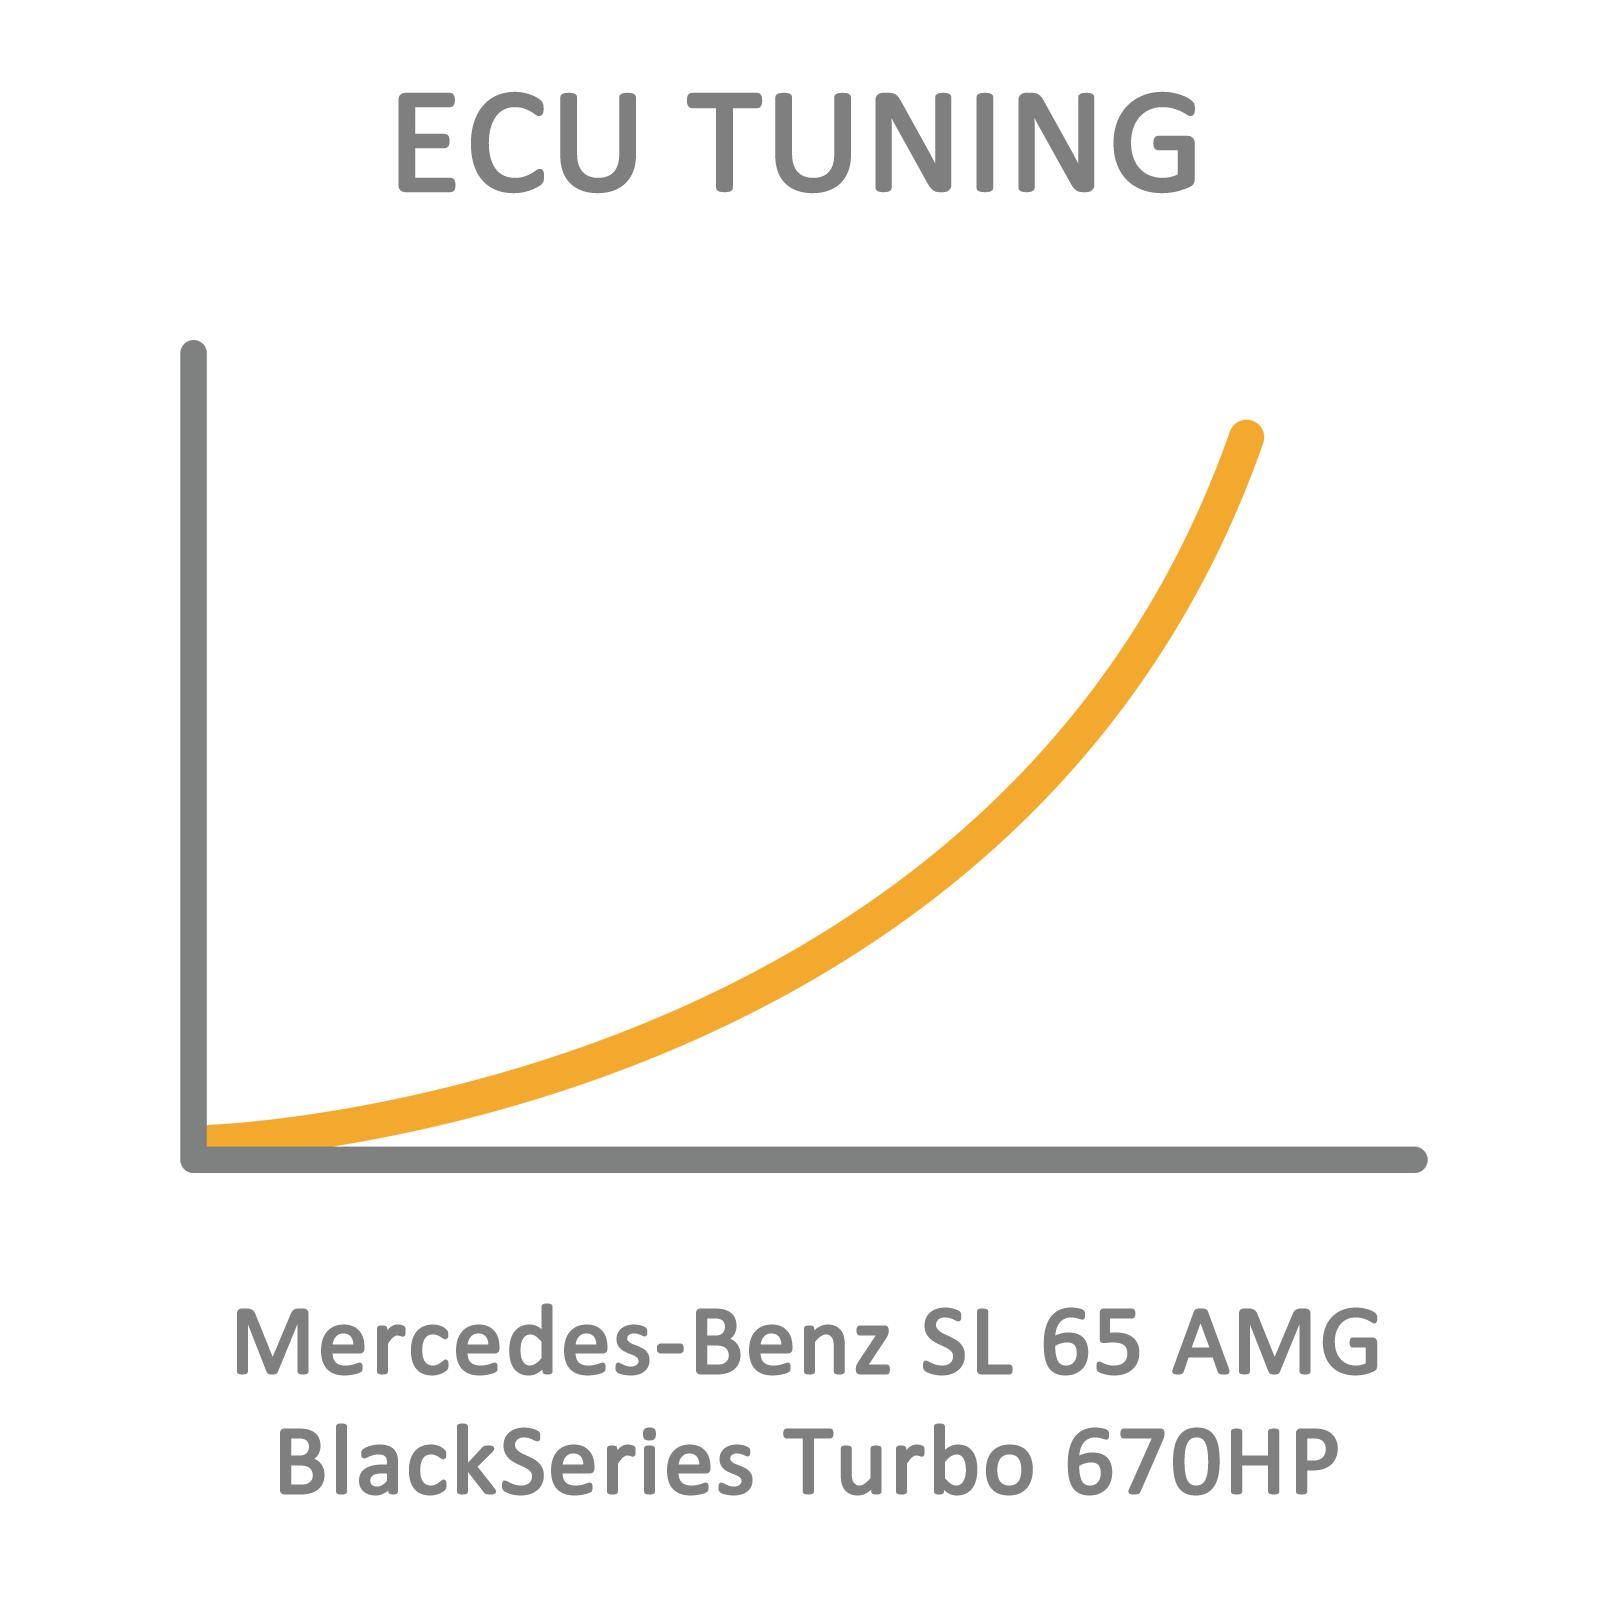 Mercedes-Benz SL 65 AMG BlackSeries Turbo 670HP ECU Tuning